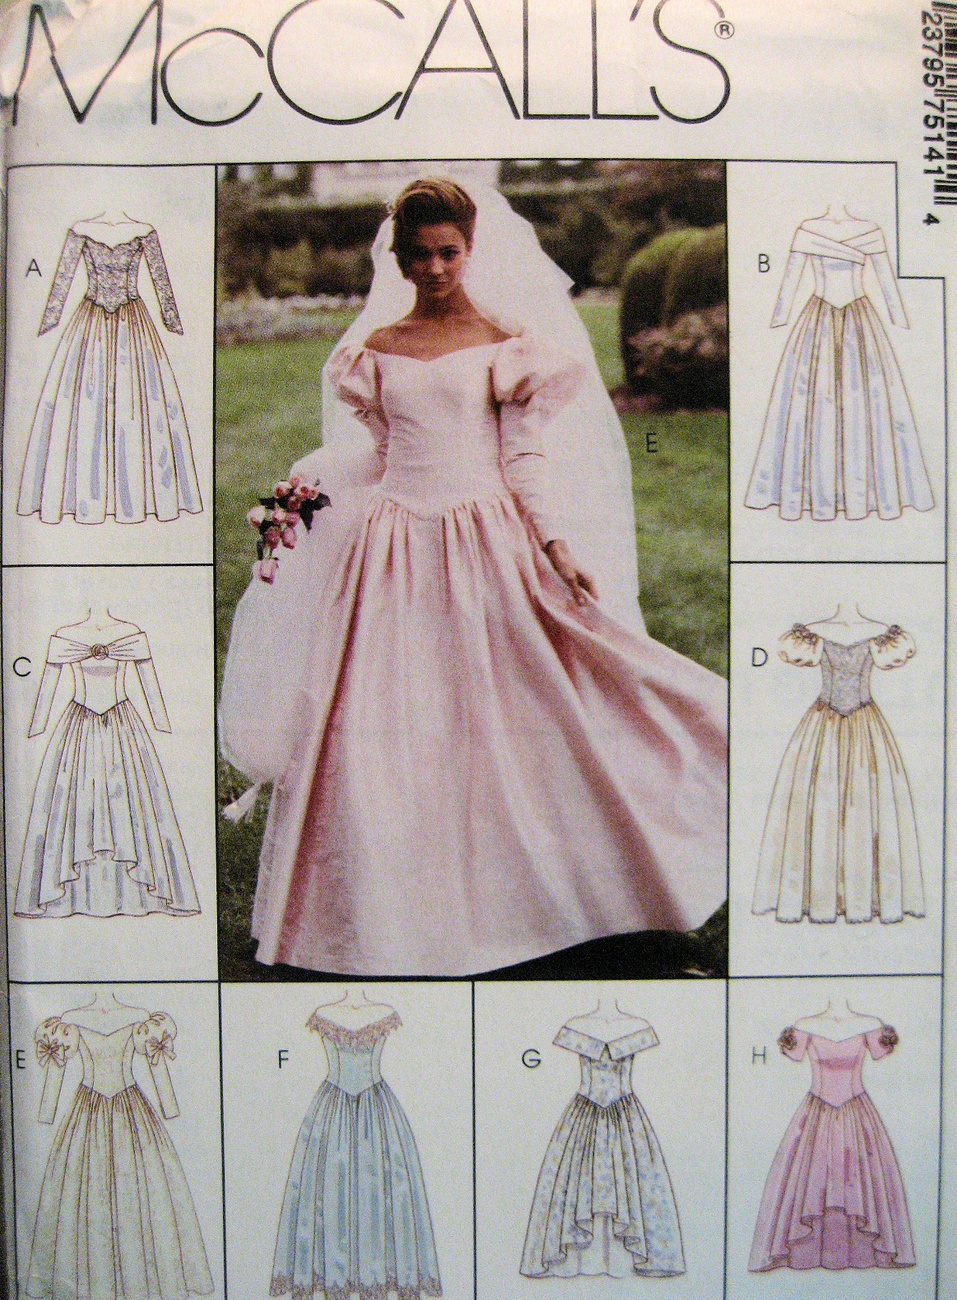 Mccalls 7514 new womens dress 8 to 12 wedding dress patern for Wedding dress patterns mccalls